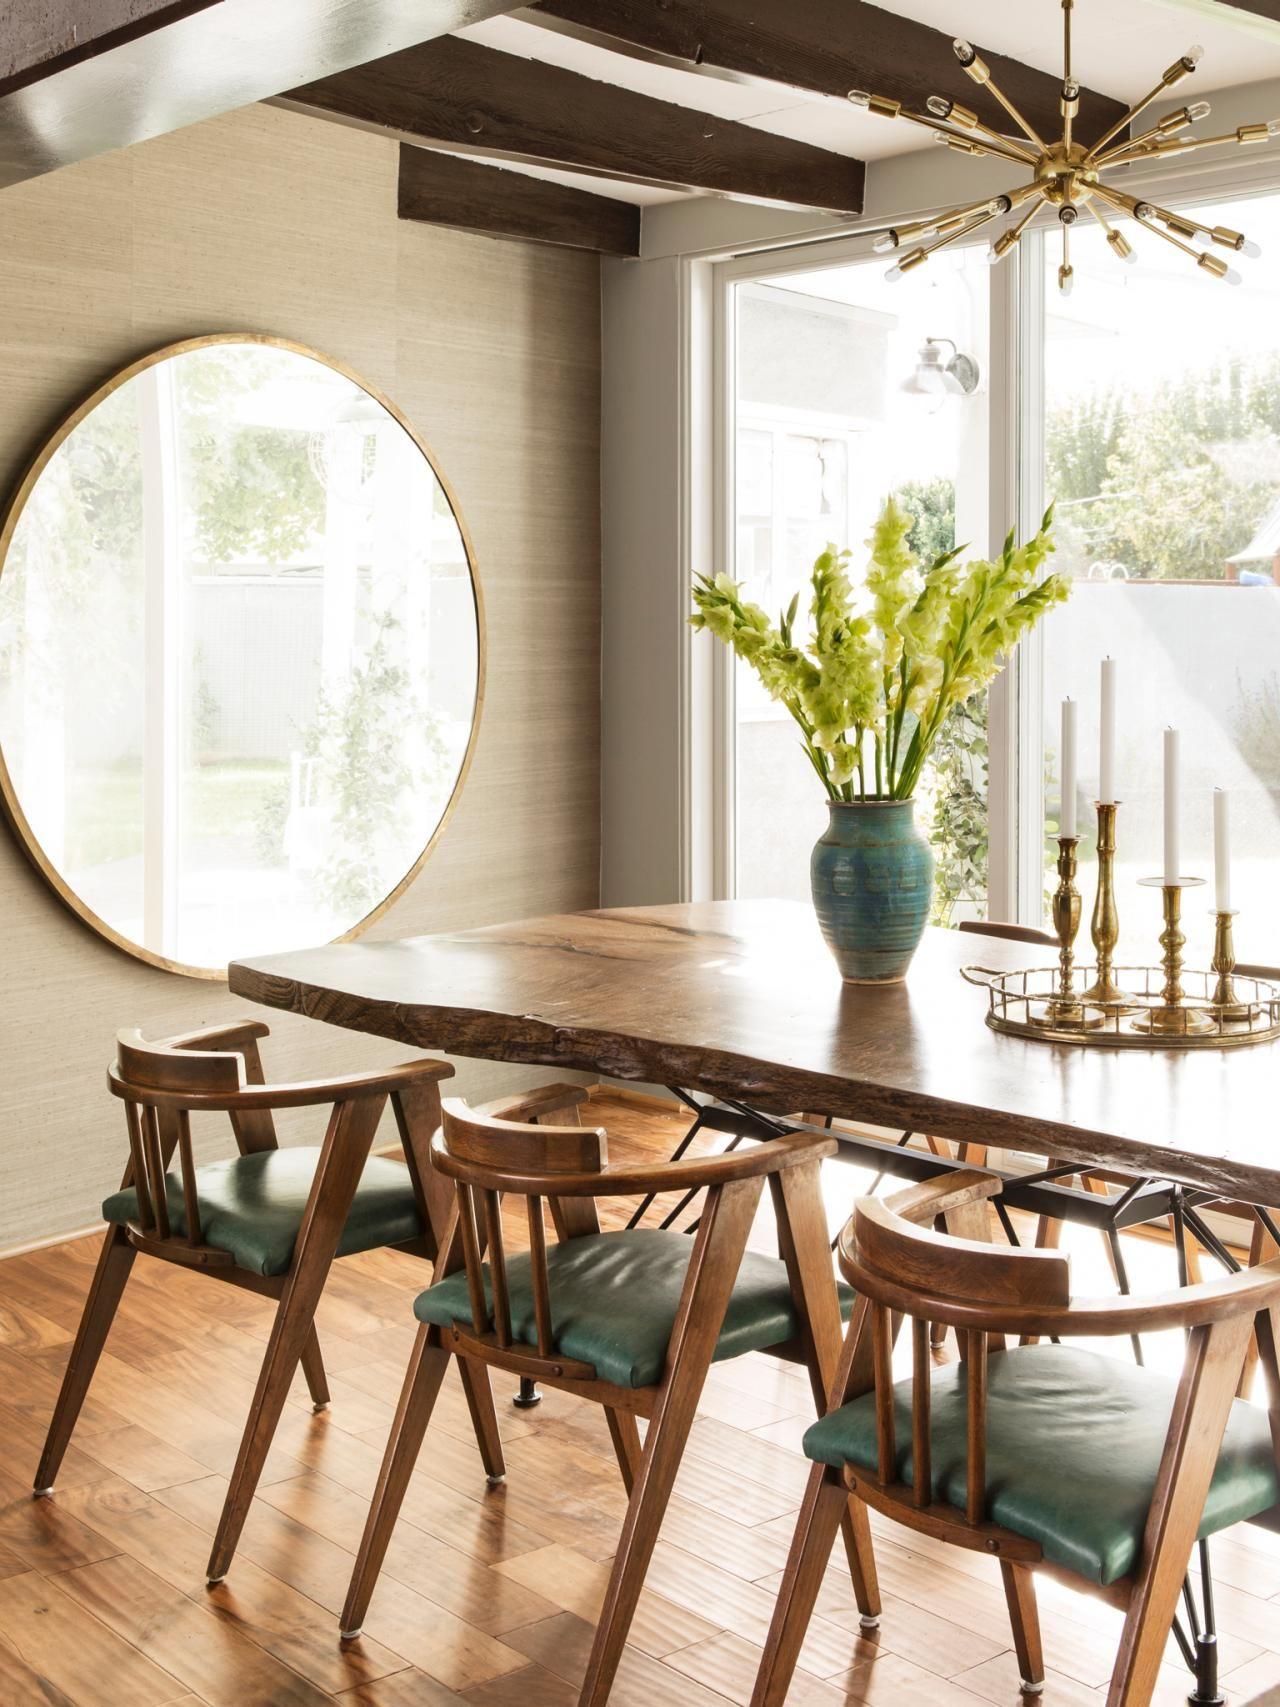 Mid Centry Modern Decorating Ideas Mid Century Modern Dining Room Mid Century Dining Room Mid Century Dining Room Tables